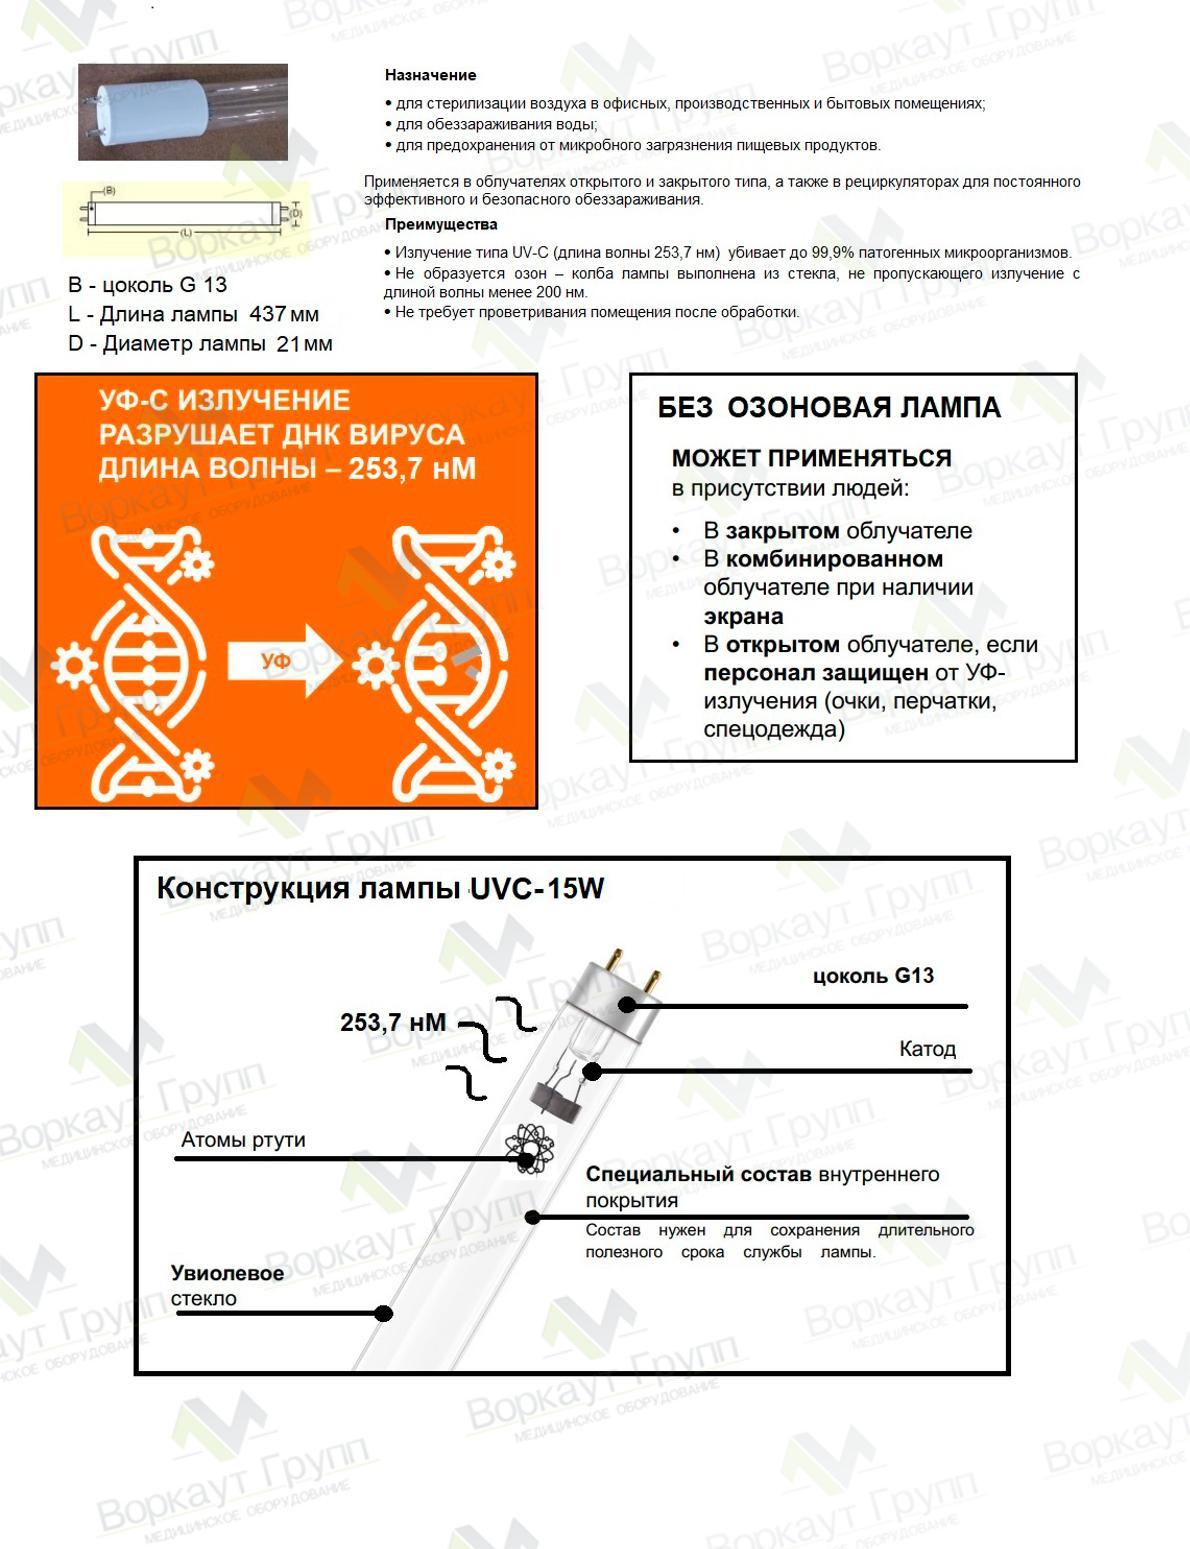 Паспорт бактерицидной лампы UVC-15W-G13